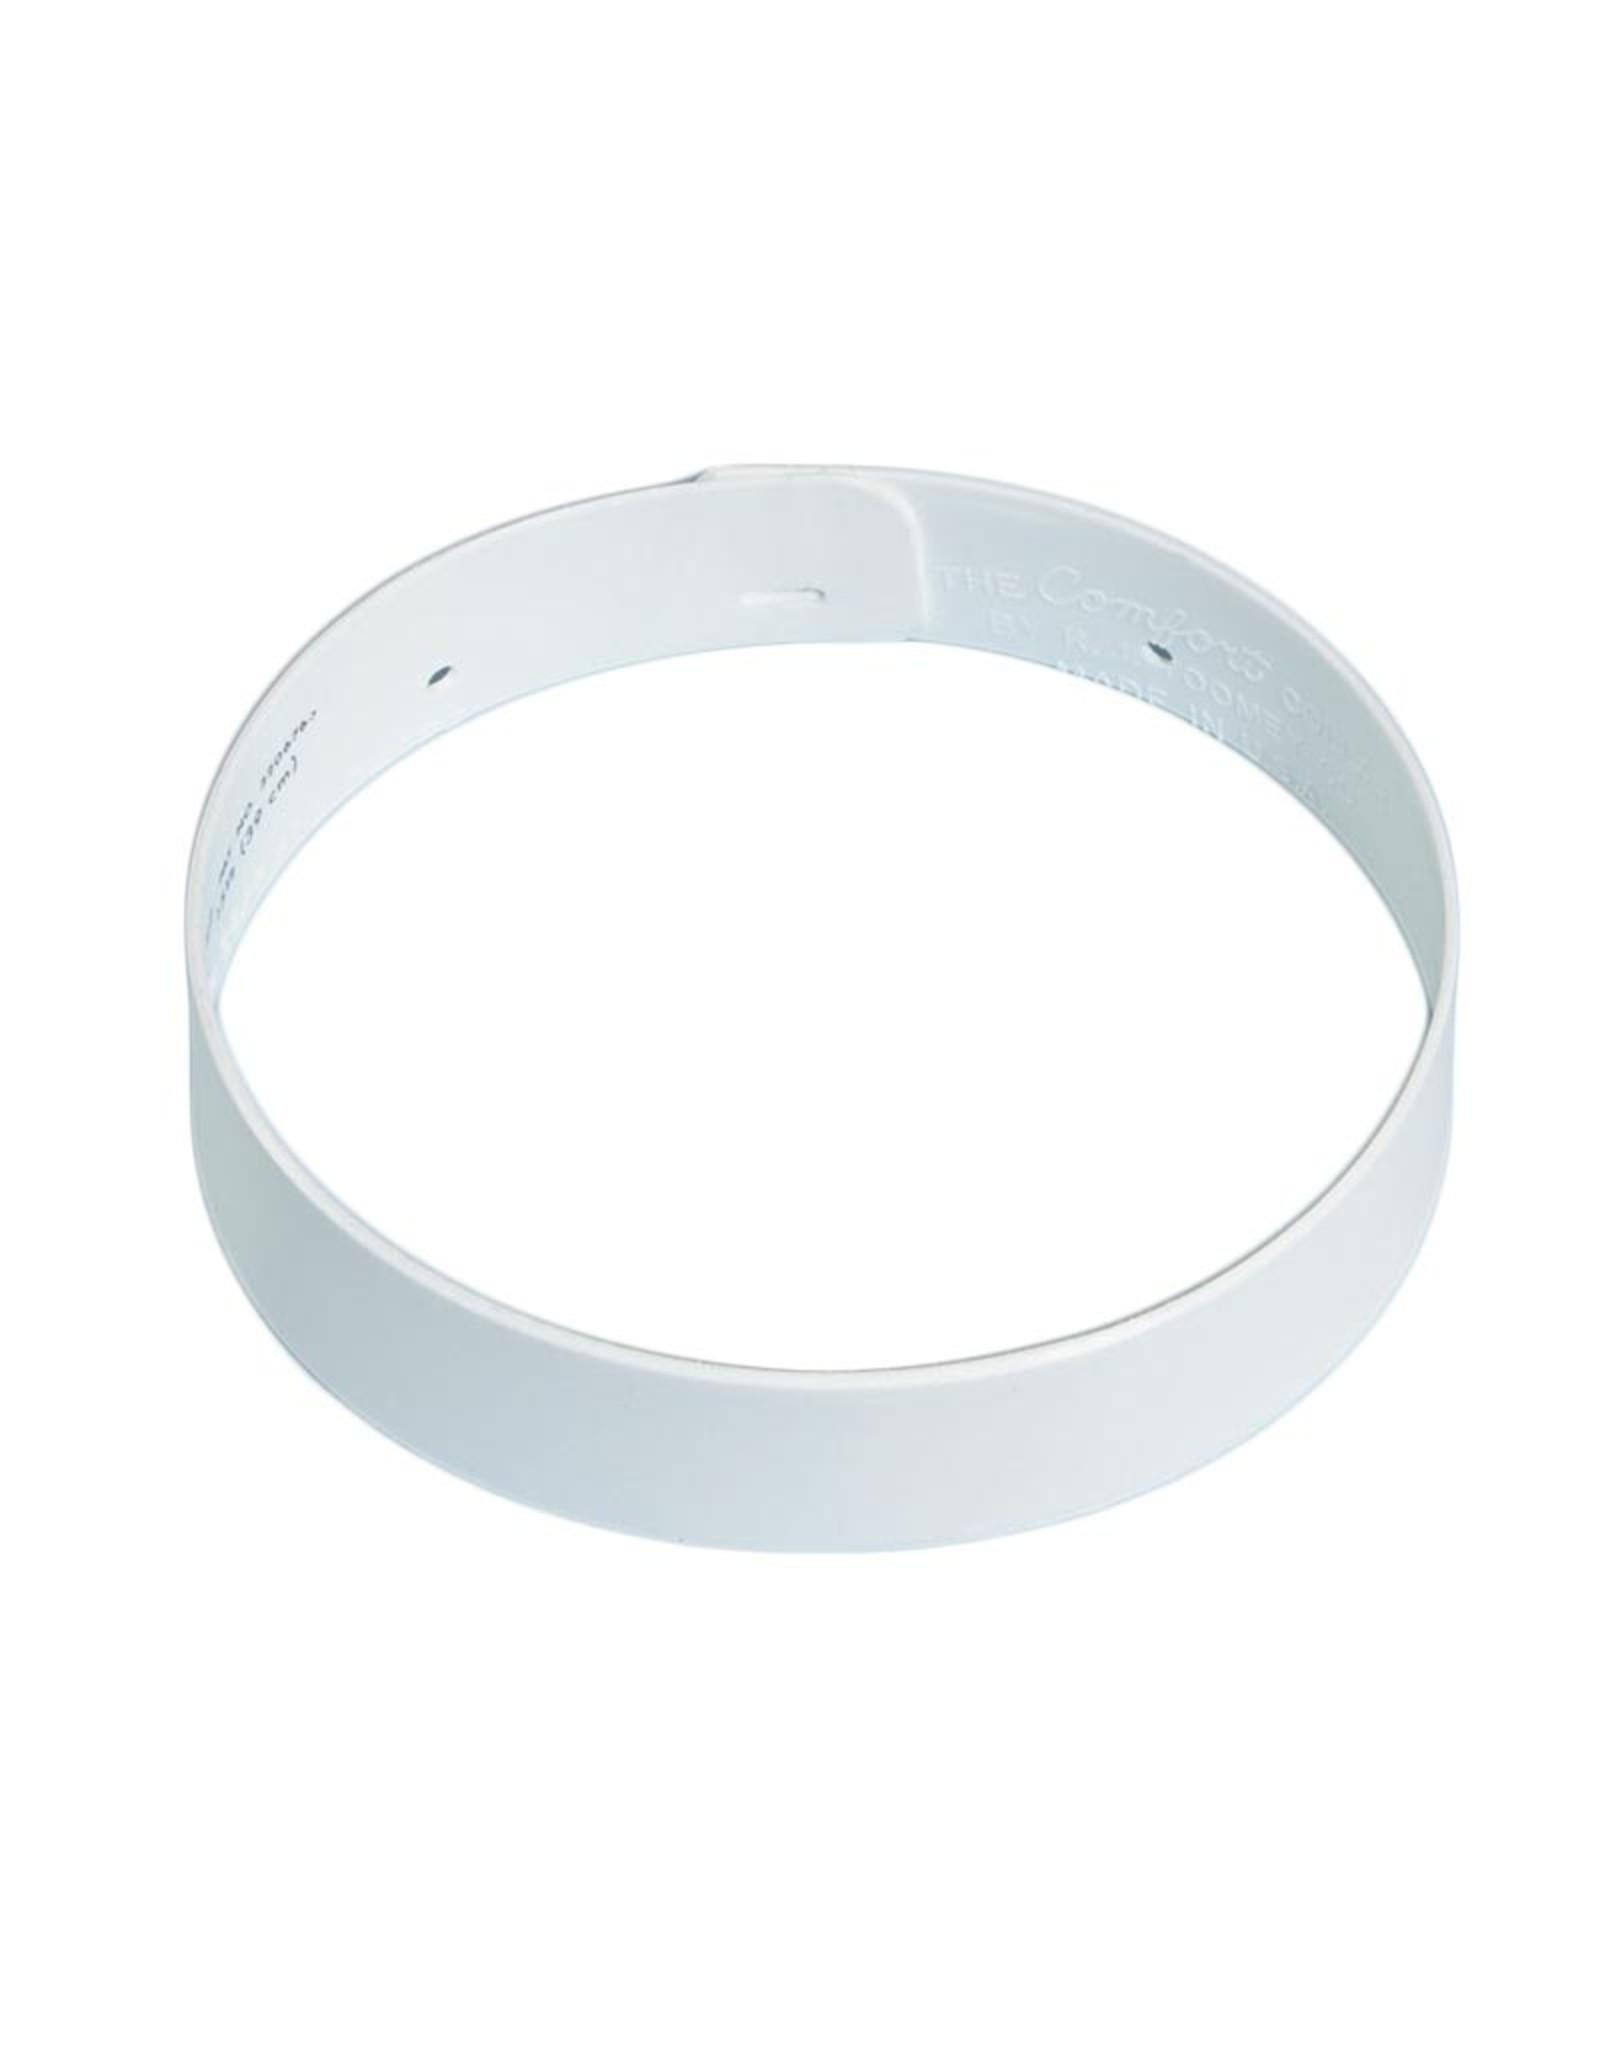 Single-Ply Comfort Collar 15 #2 Collar Height